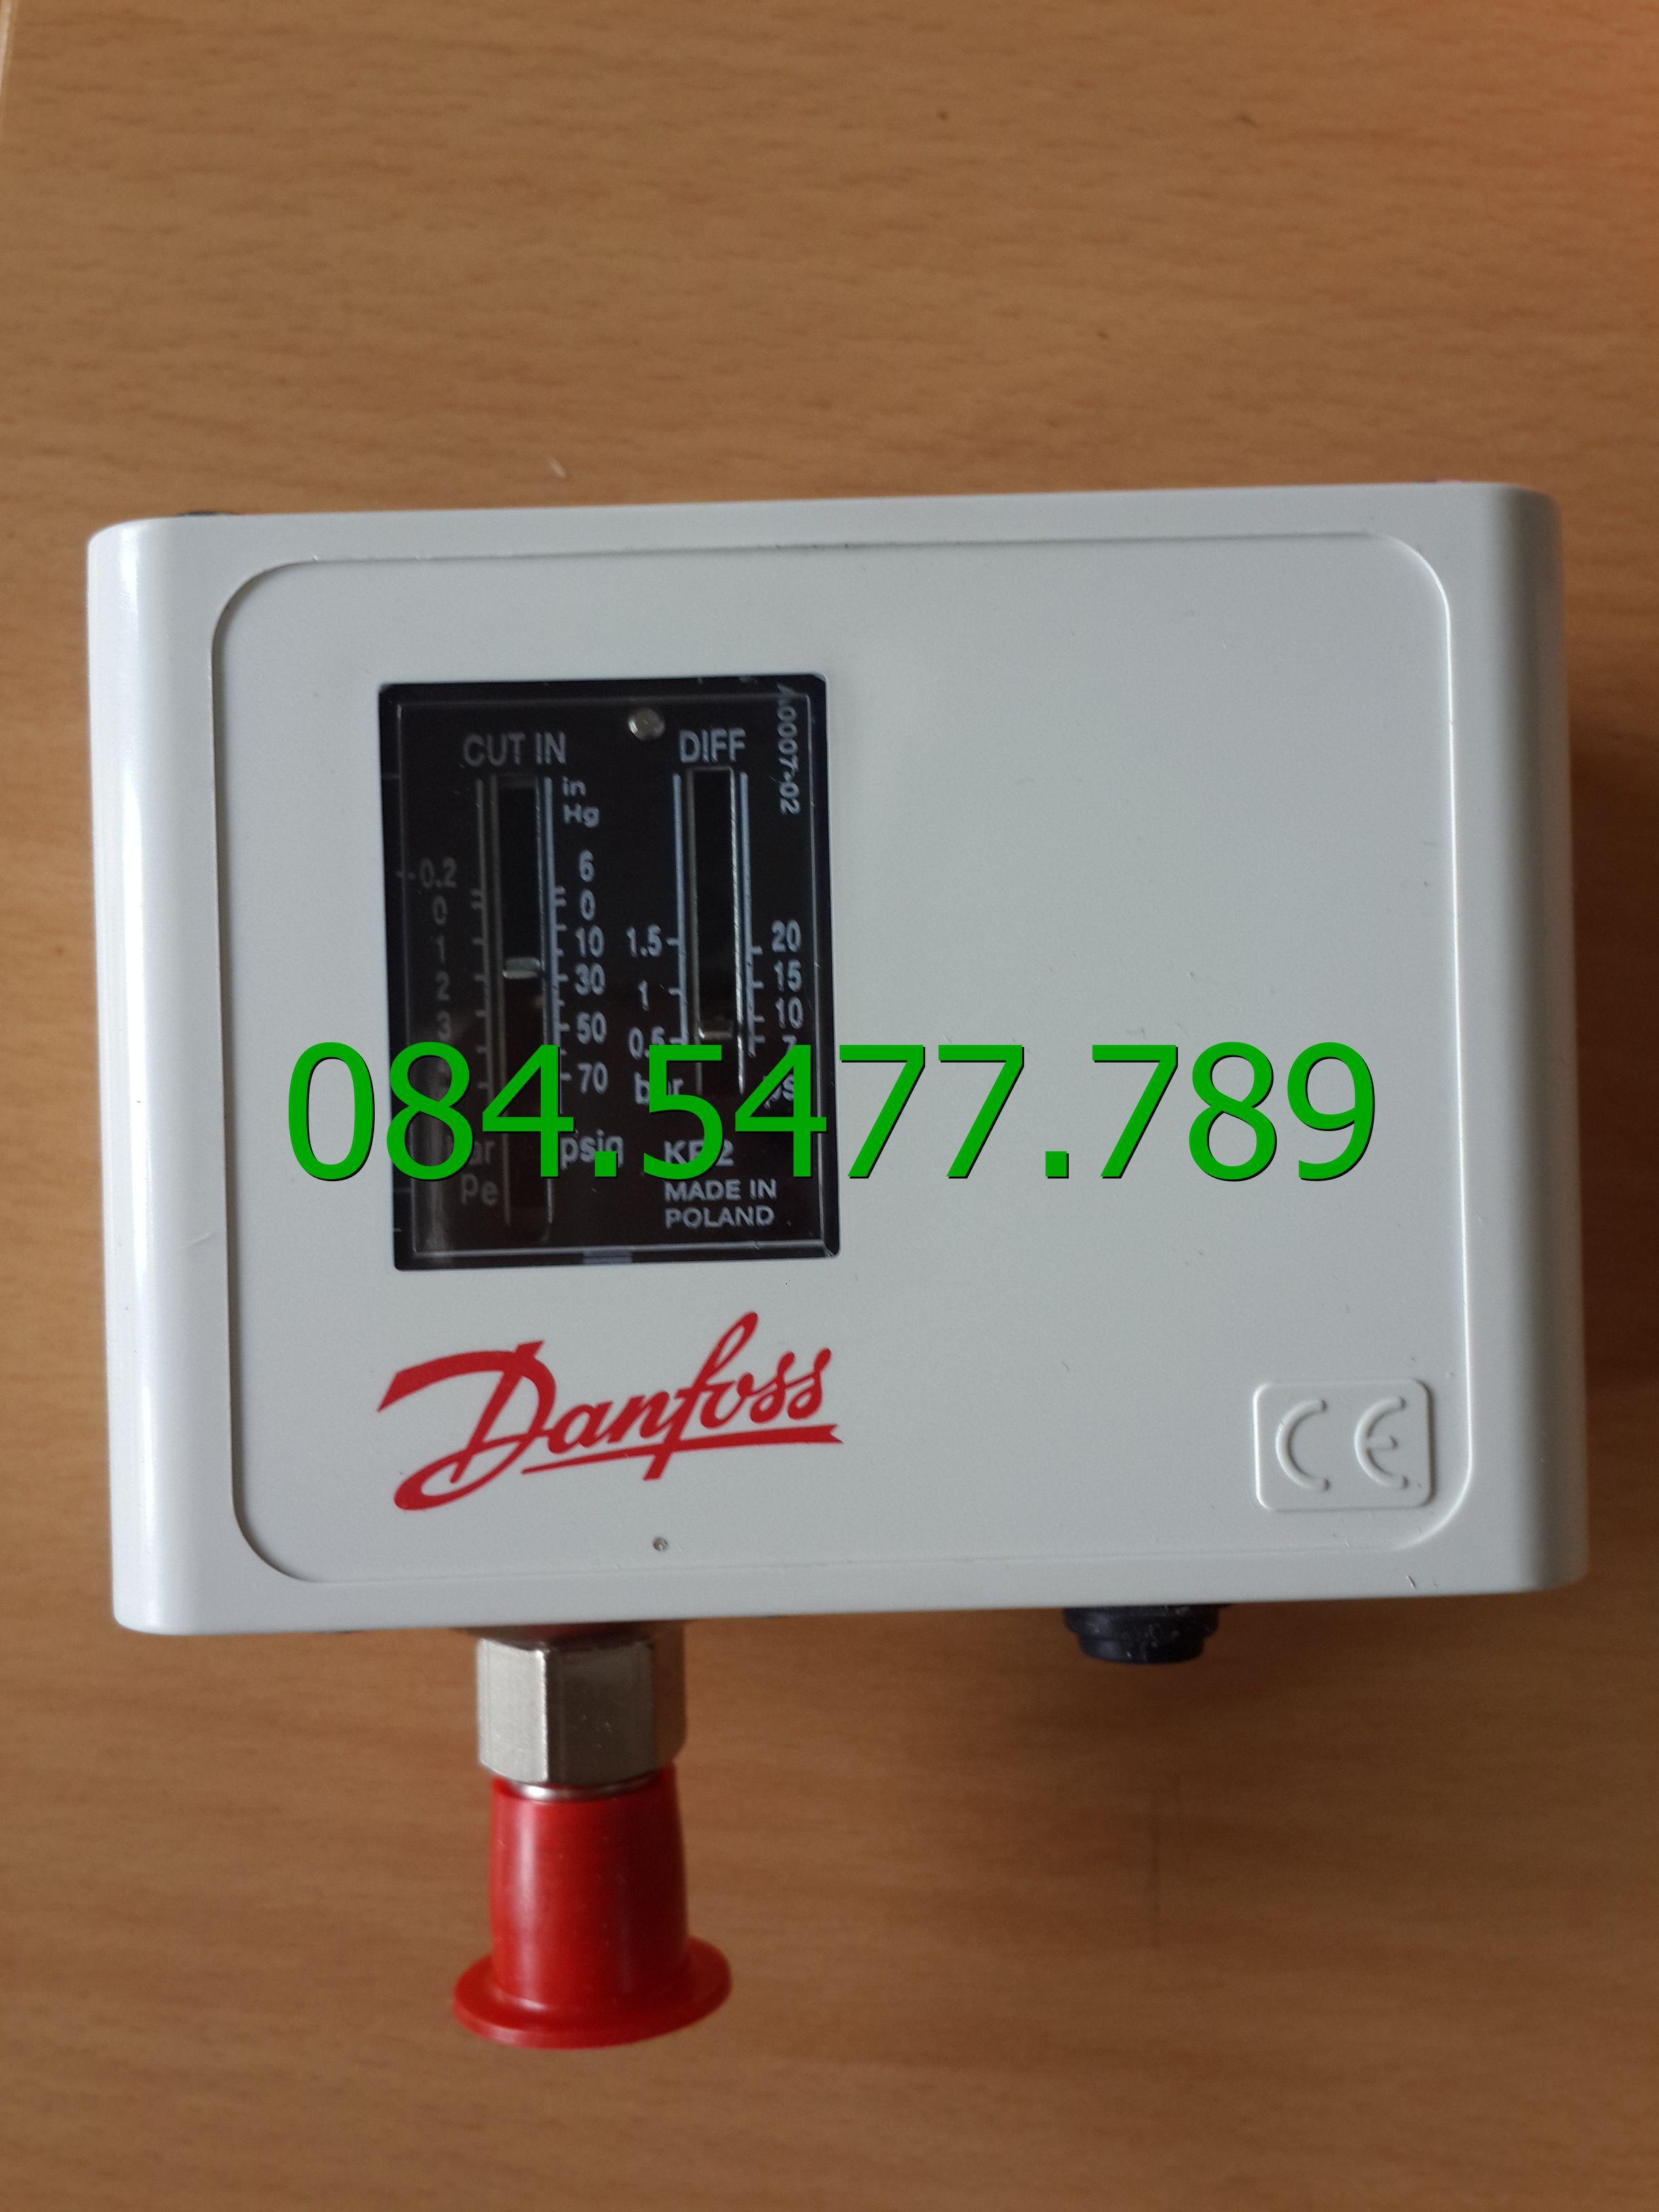 Thiết bị kiểm tra áp suất KP5 Danfoss